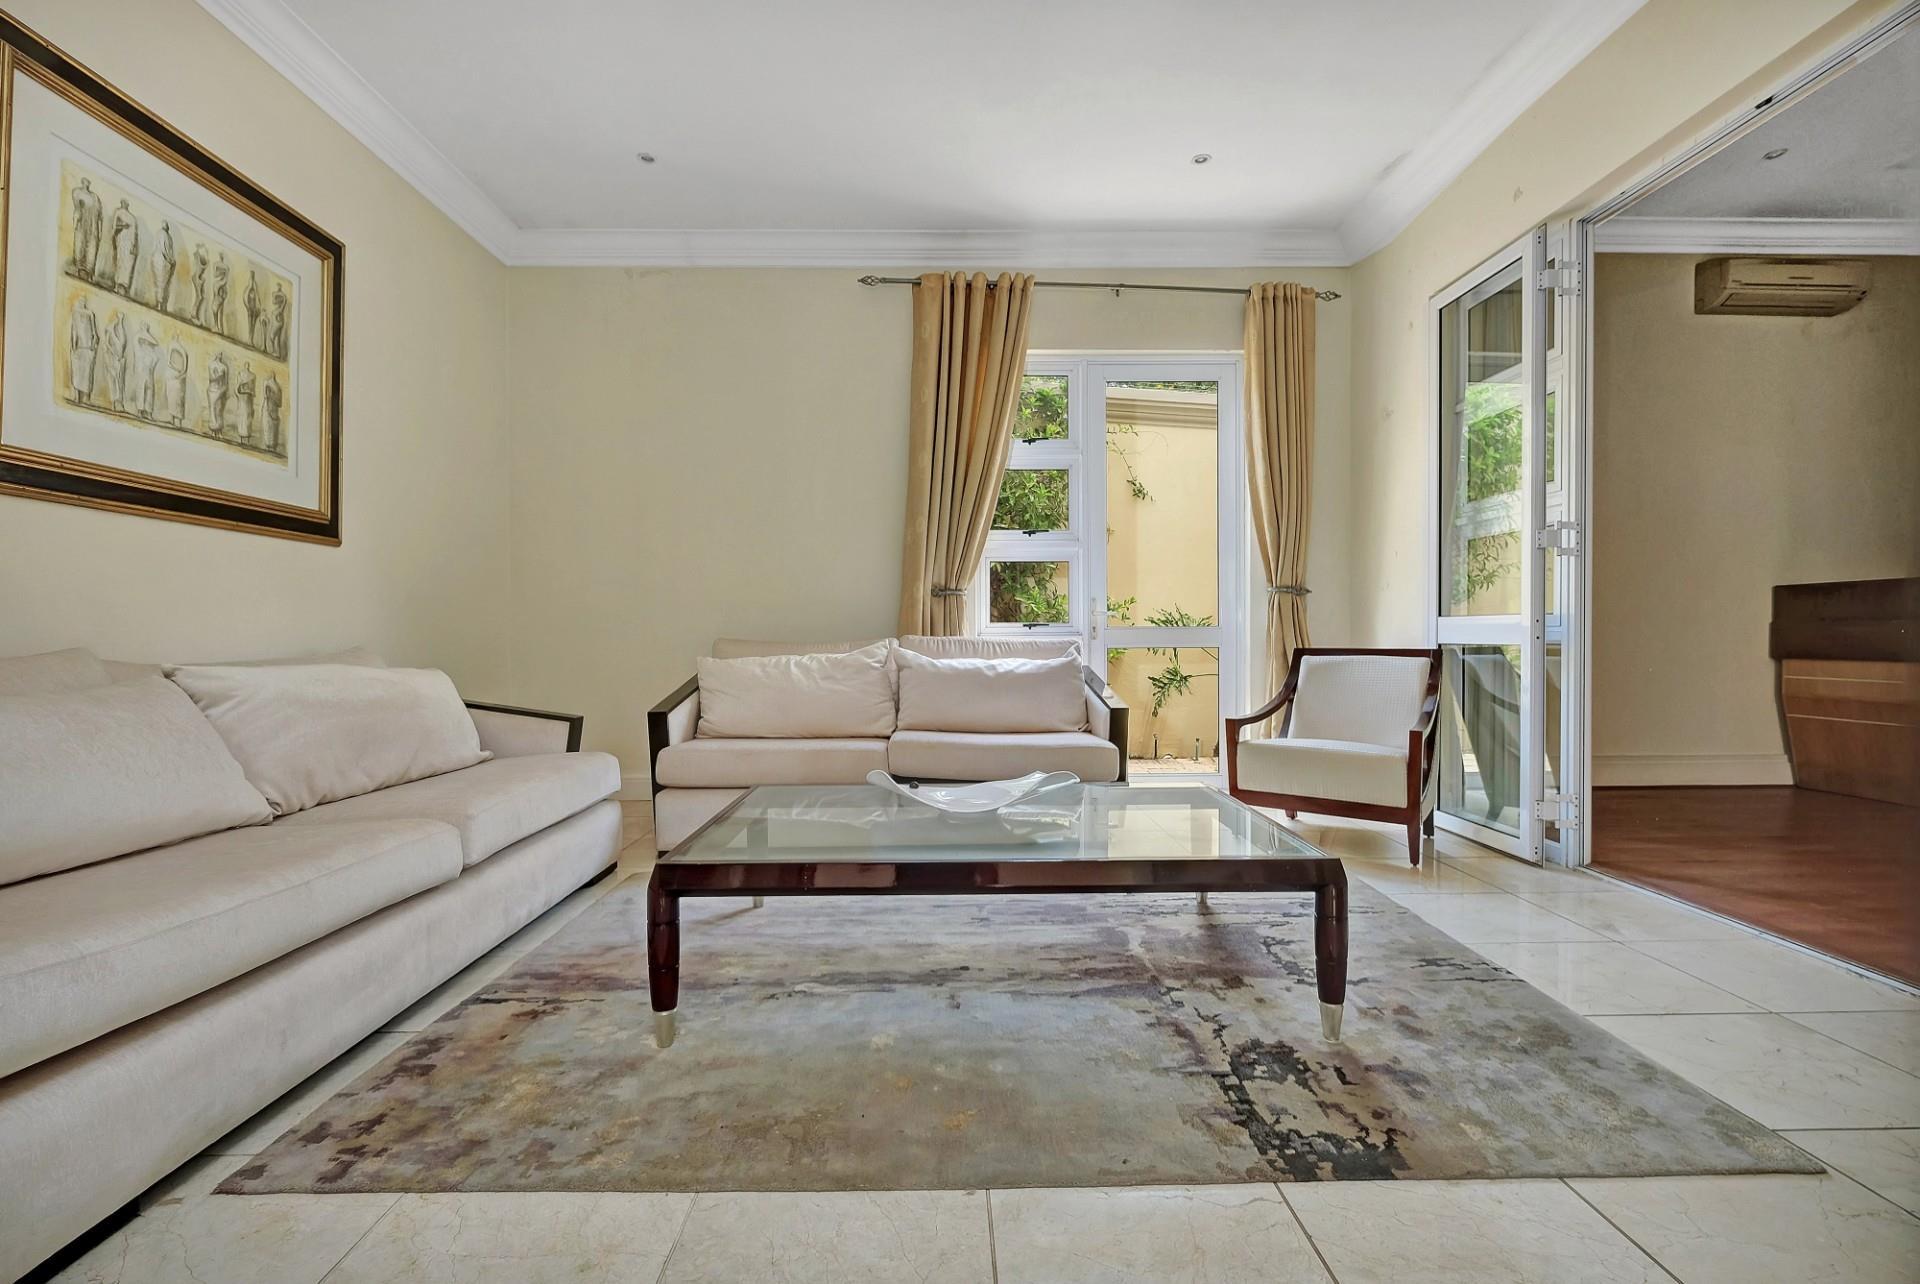 4 Bedroom House To Rent in Sandhurst